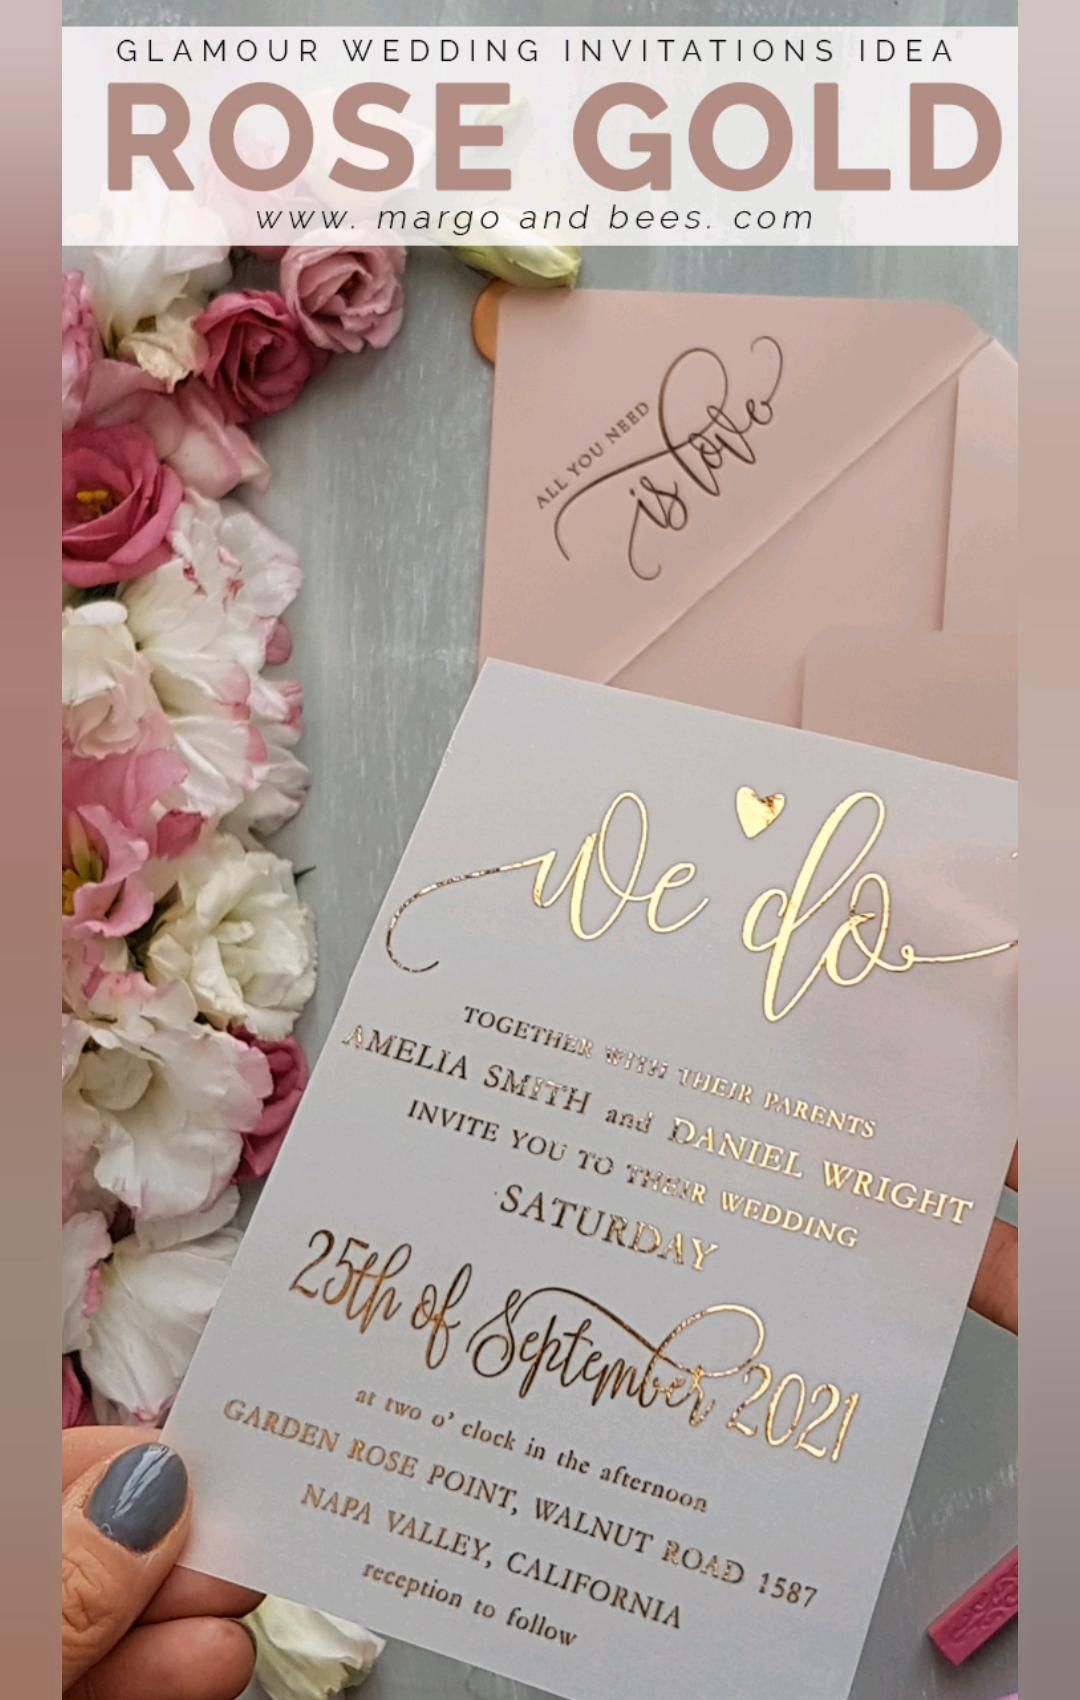 Rose Gold wedding invitations -   18 wedding Invitations pink ideas